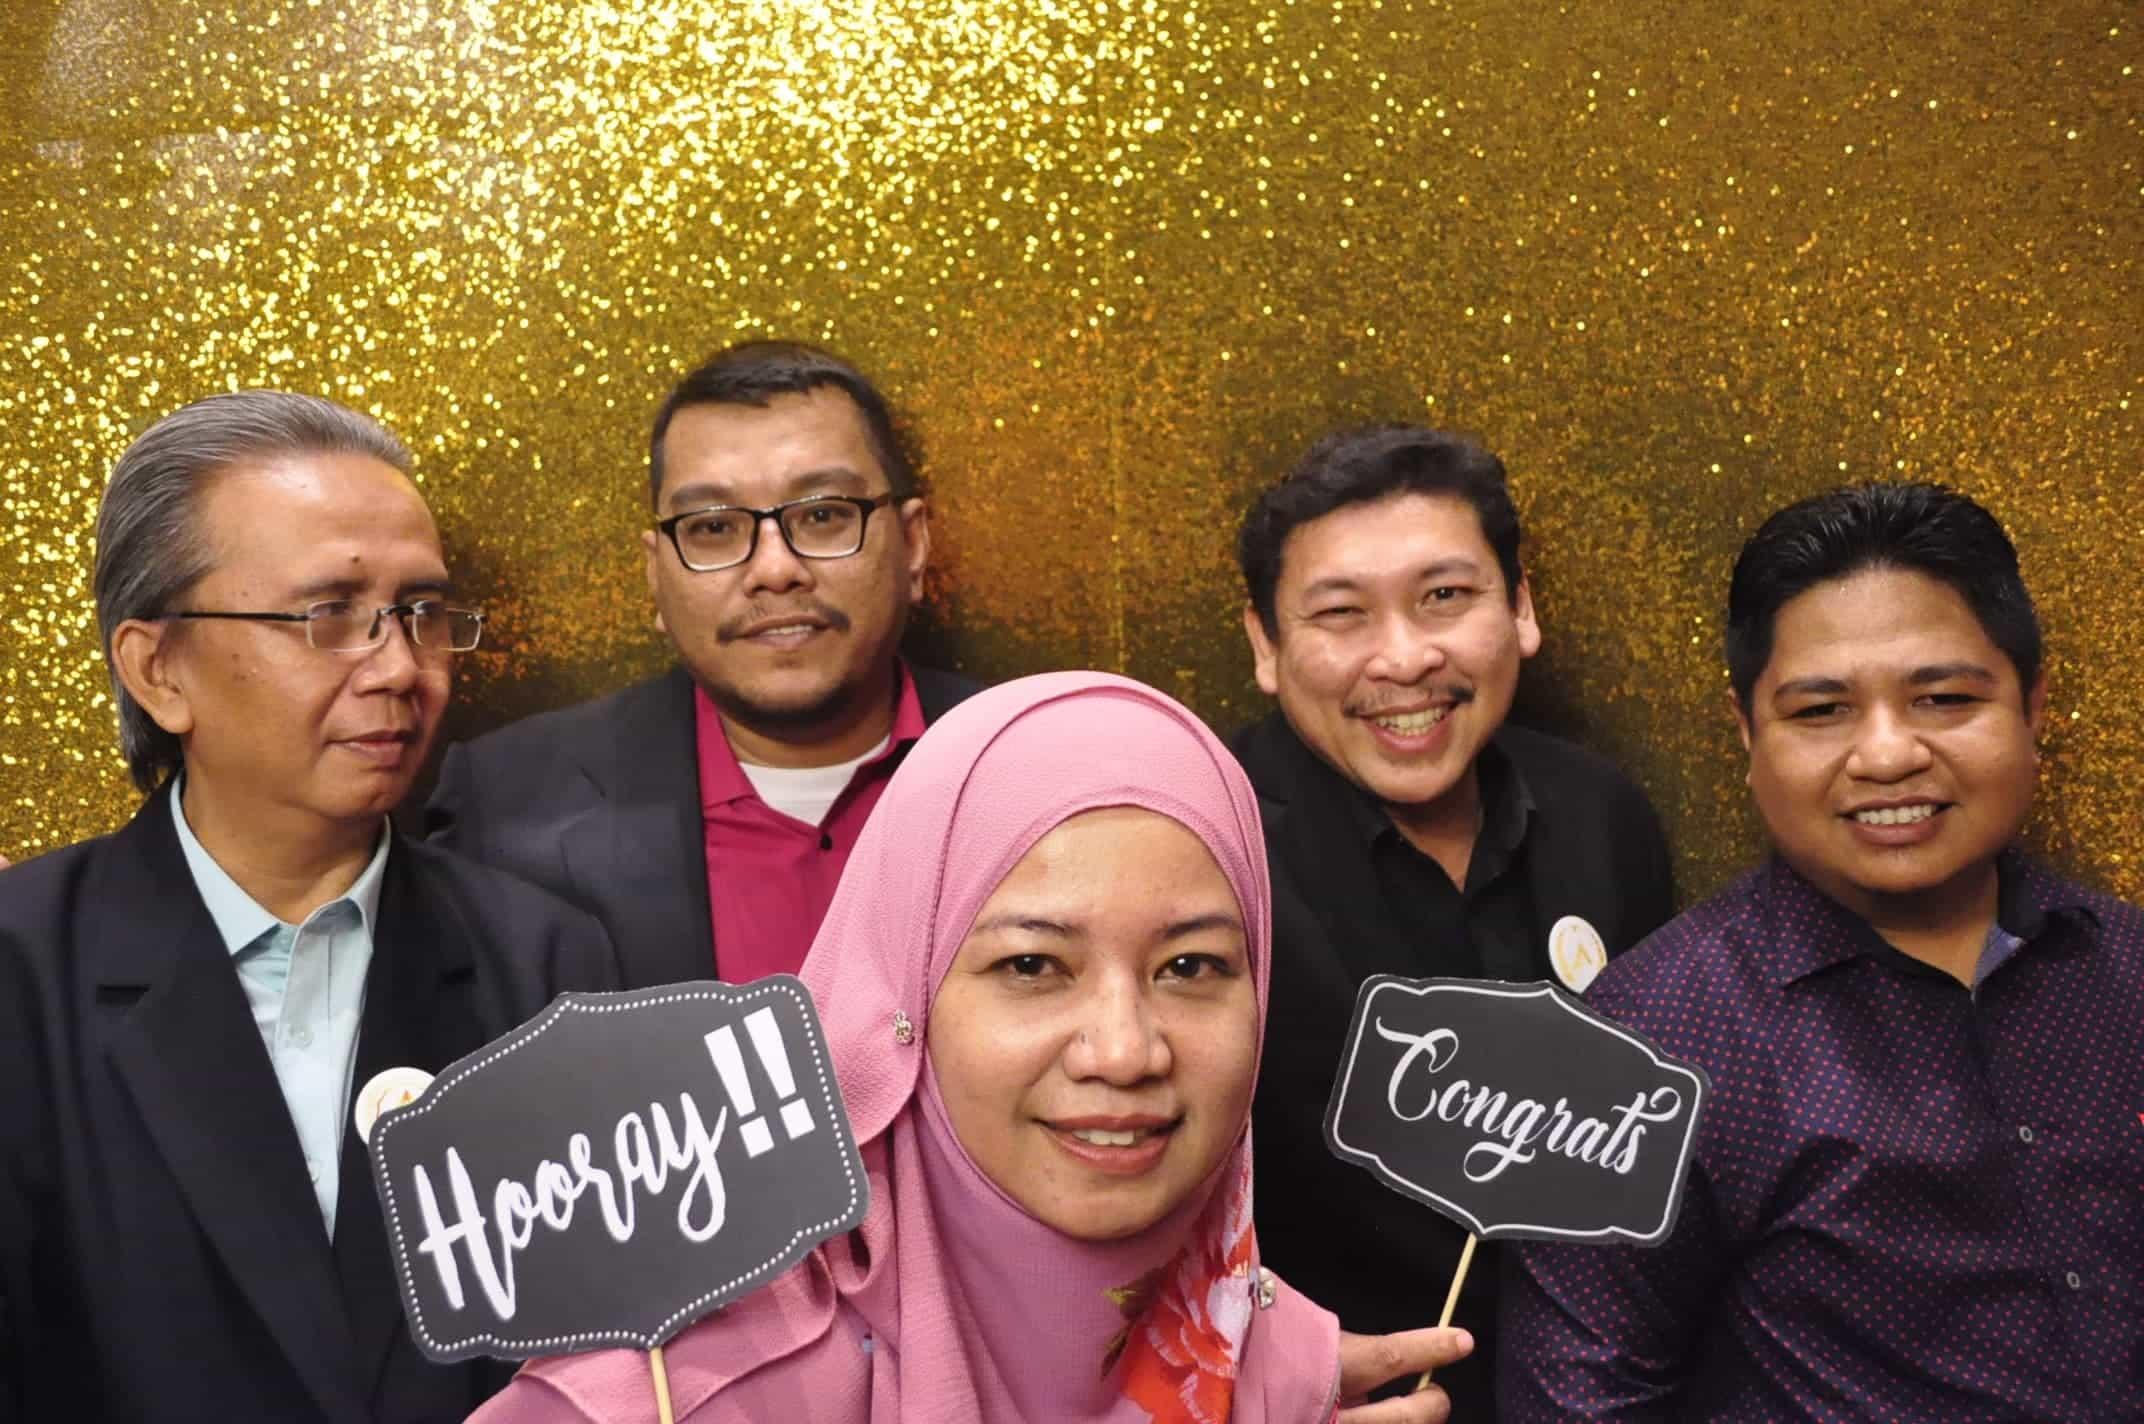 Malam Gala Anggun 2018 (Photobooth) 22